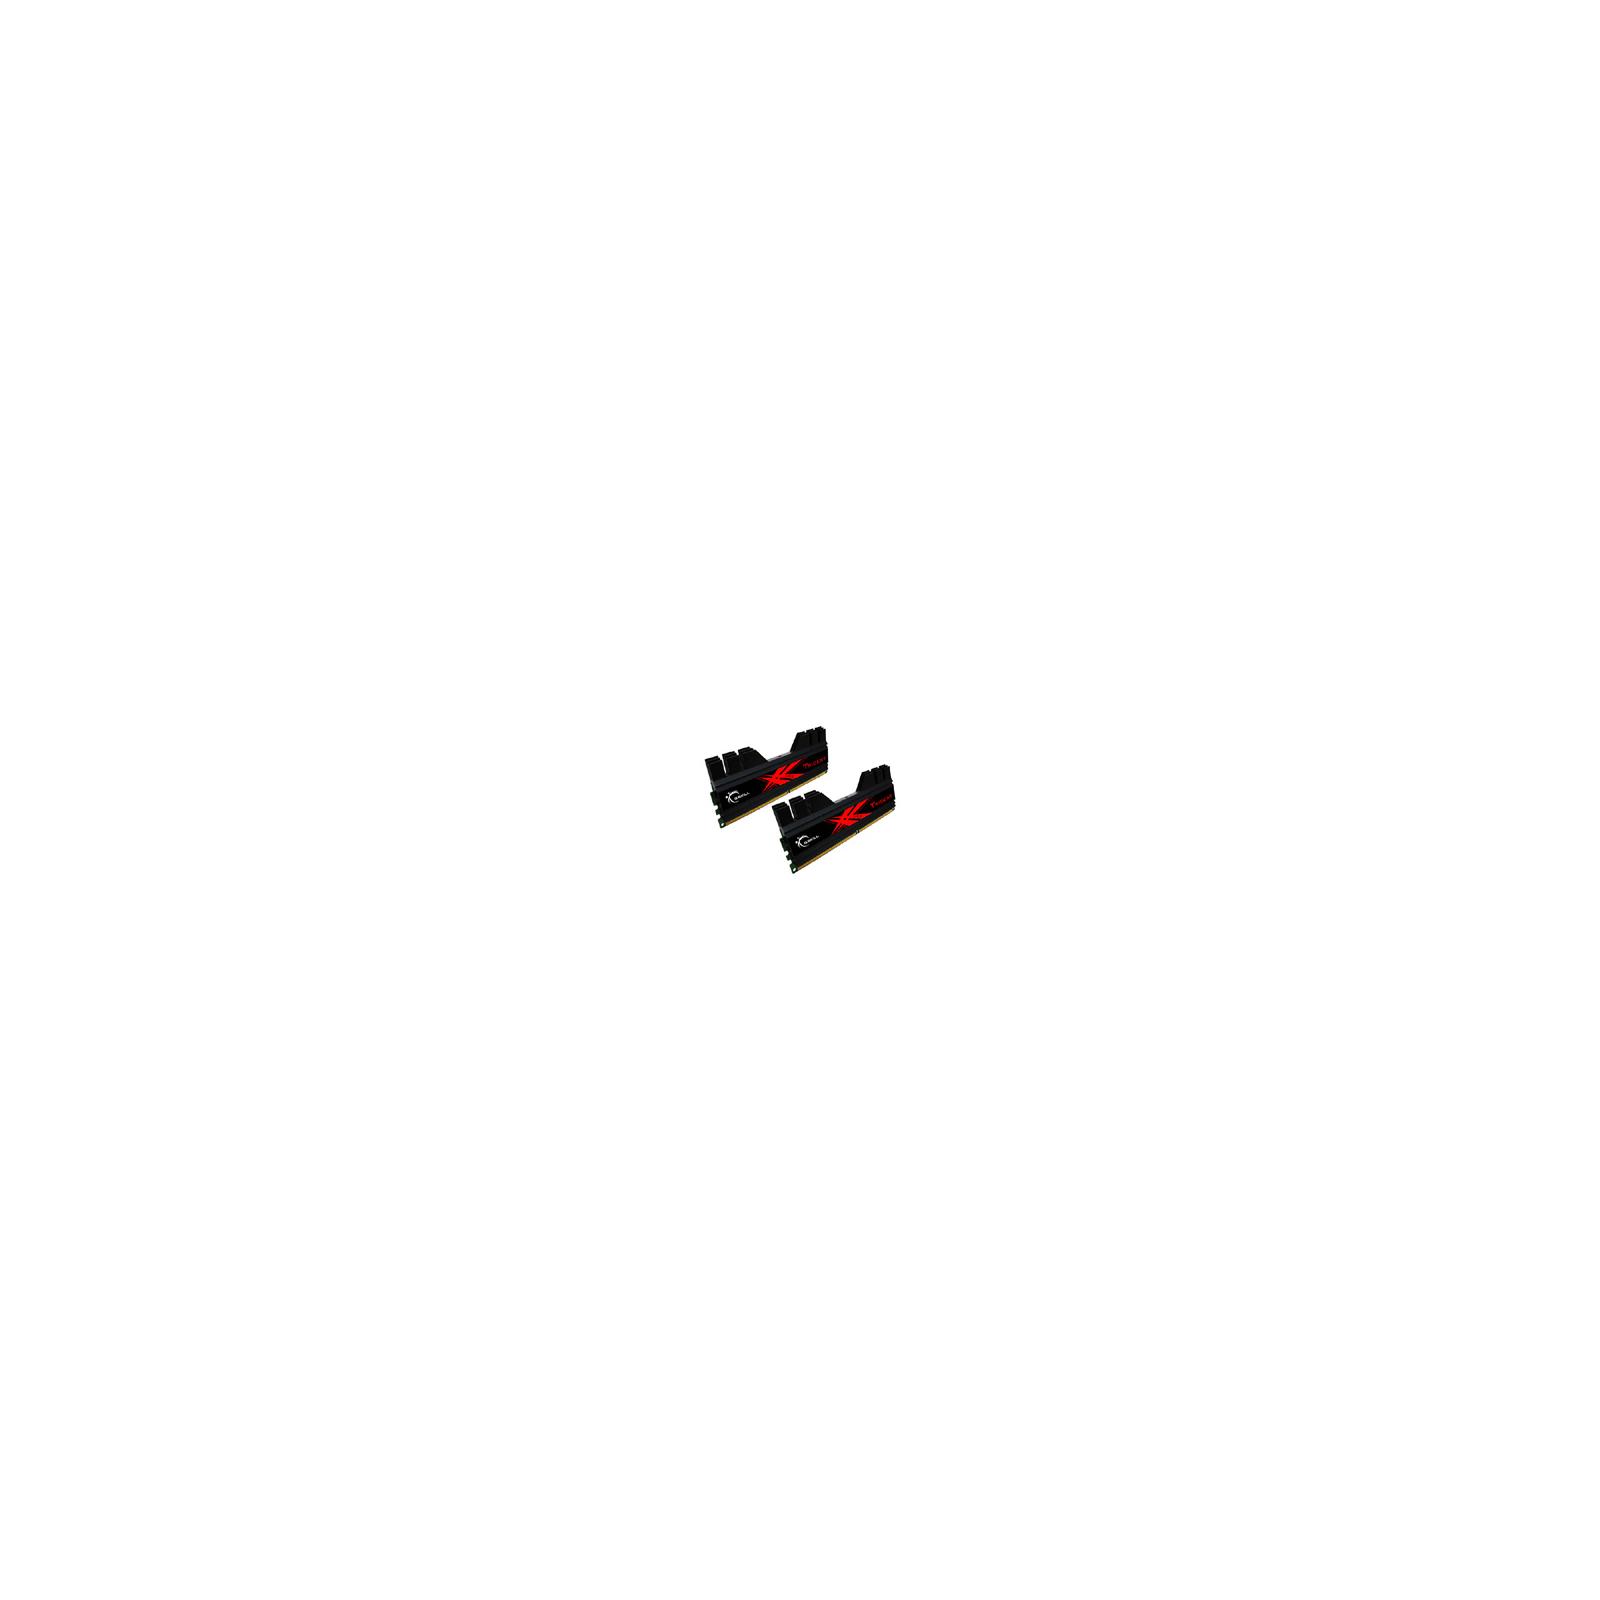 Модуль памяти для компьютера DDR3 4GB (2x2GB) 1600 MHz G.Skill (F3-12800CL8D-4GBTD)